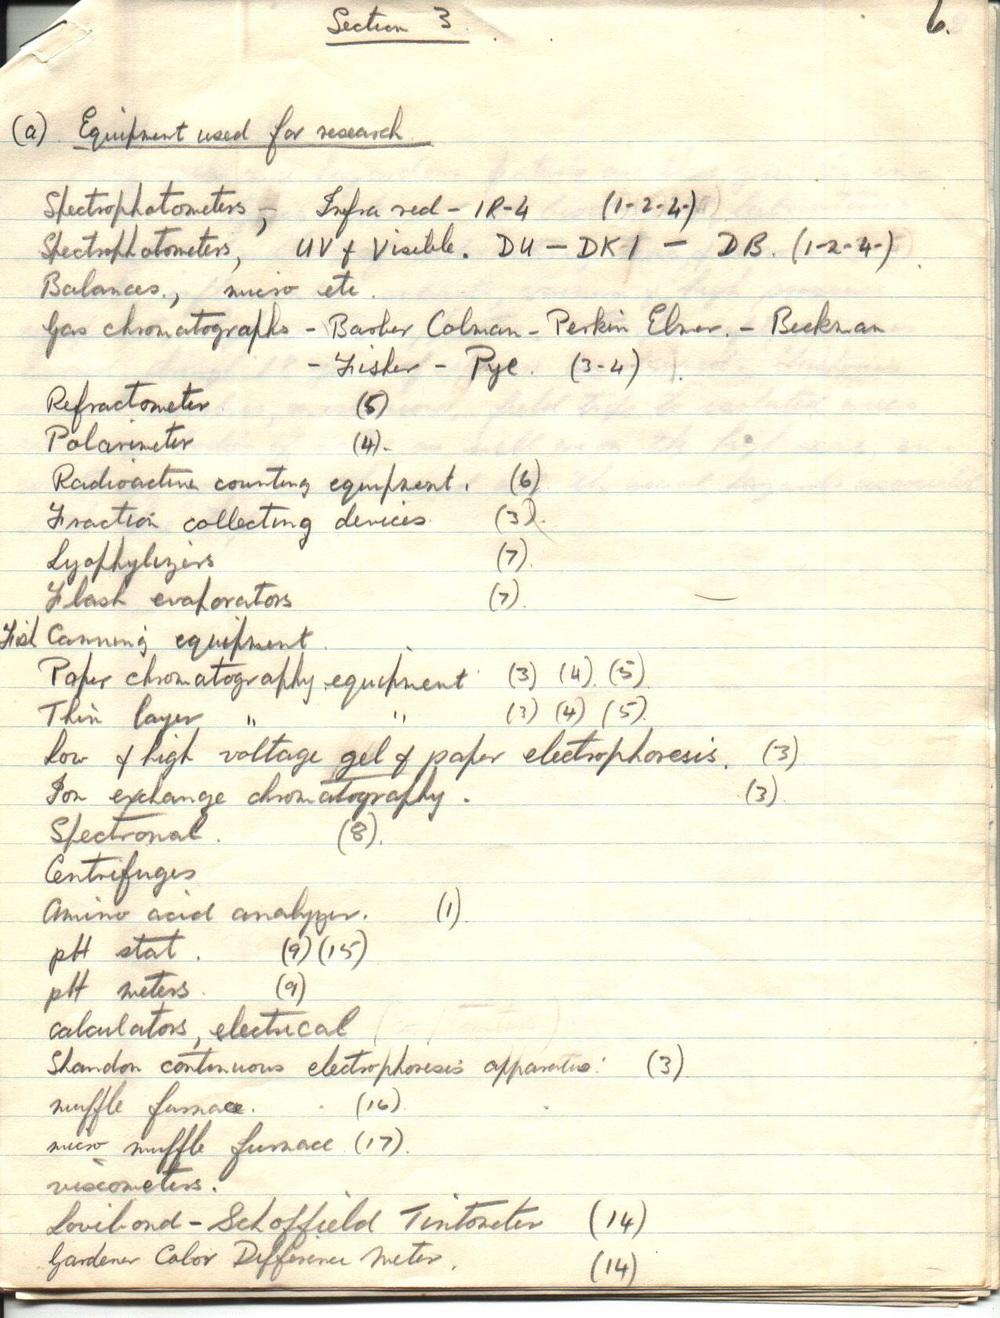 Notes: A.P.Ronald